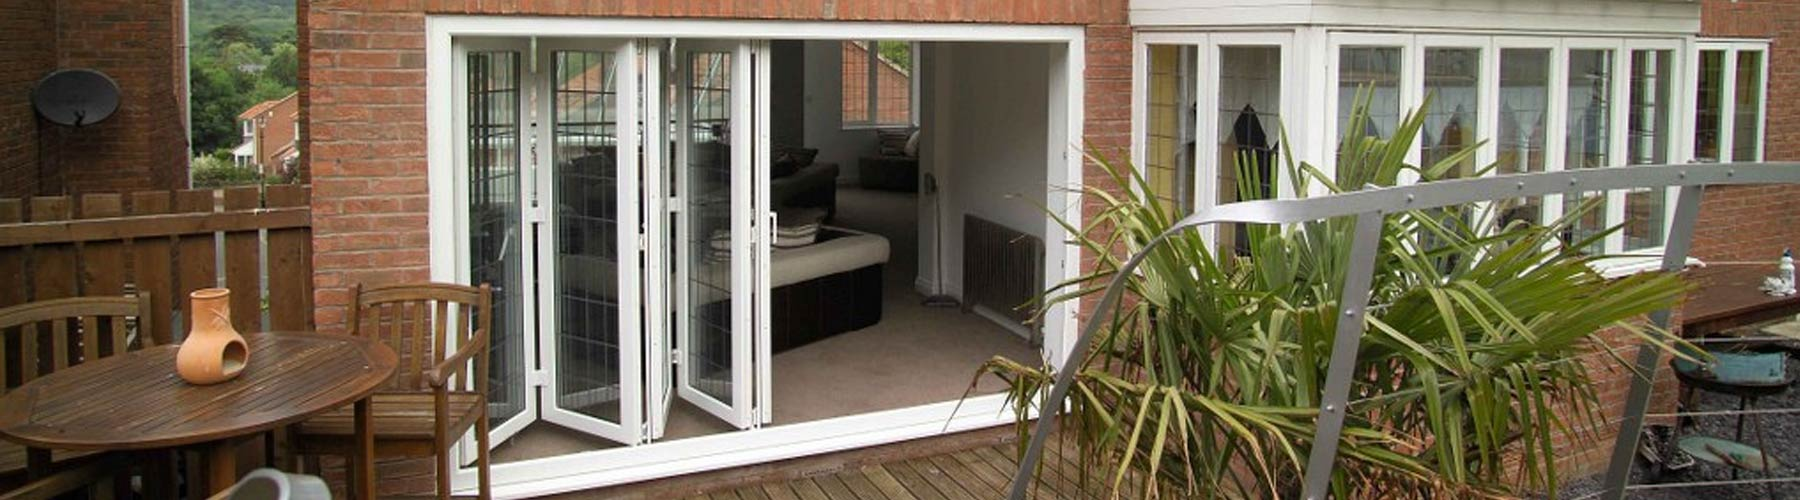 R700 Upvc Bi Fold Doors Bifold Doors Bi Folding Doors